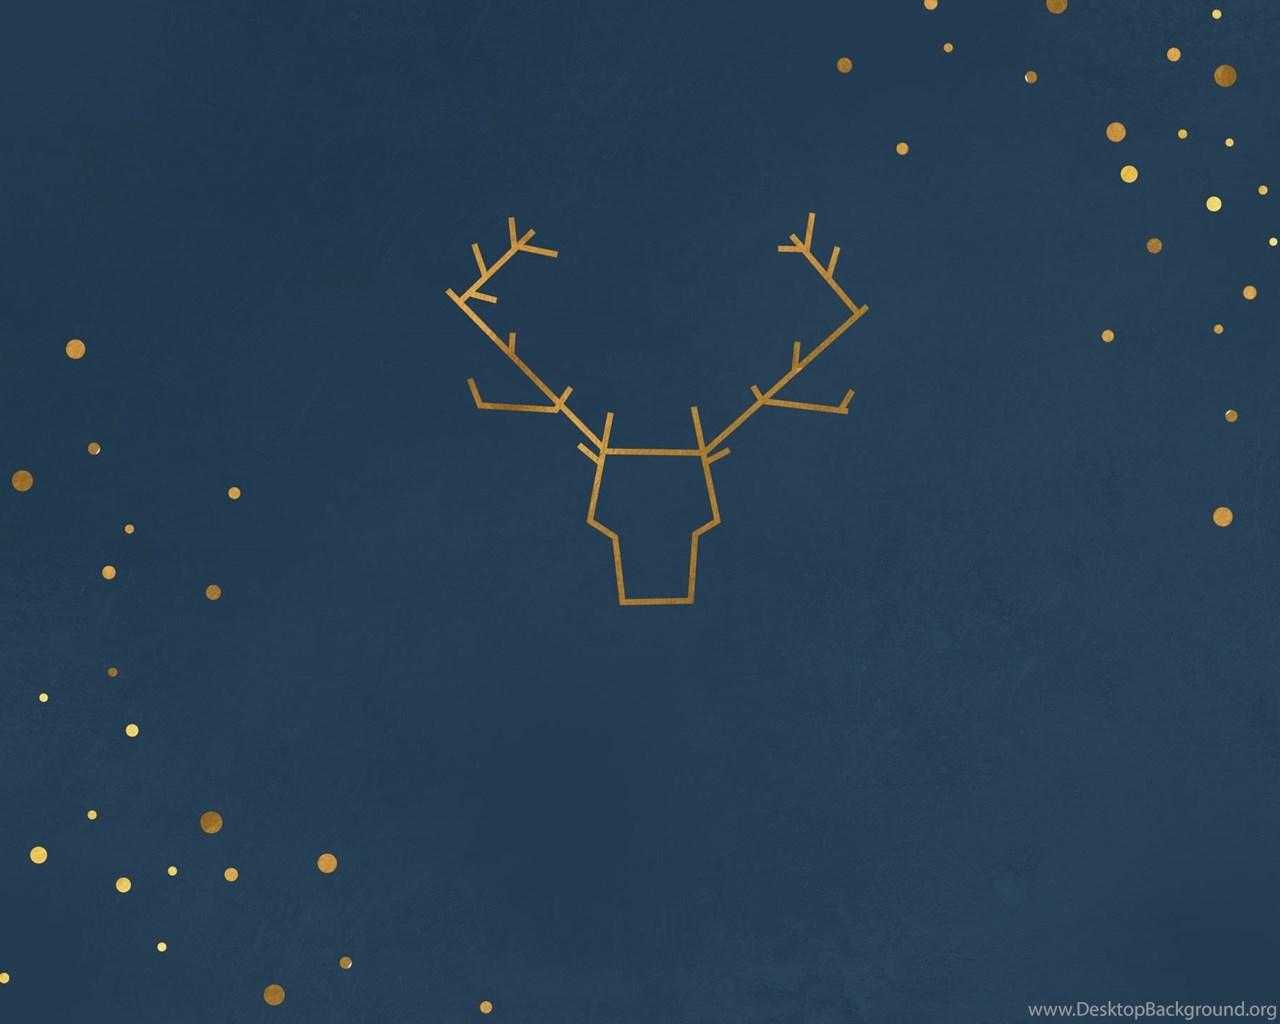 Most Inspiring Wallpaper Mac Christmas - 244421_christmas-backgrounds-mac-wallpapers-1079104_2560x1440_h  Picture_65649.jpg